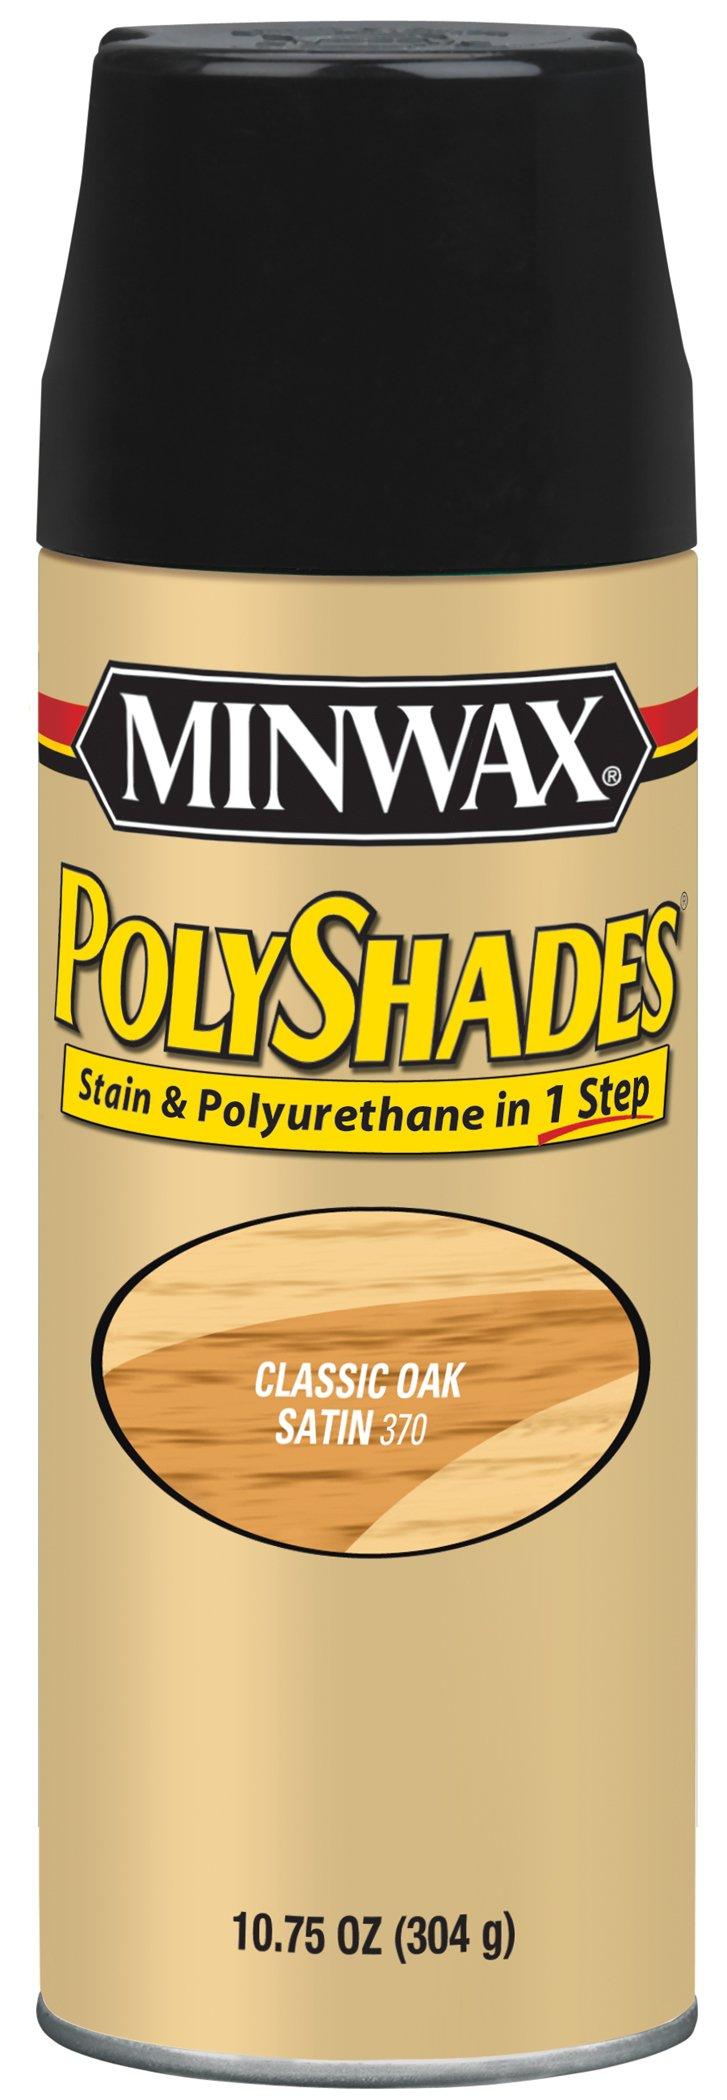 Minwax 313700000 Polyshades - Stain & Polyurethane in 1 Step, 10.75 ounce Spray, Classic Oak, Satin